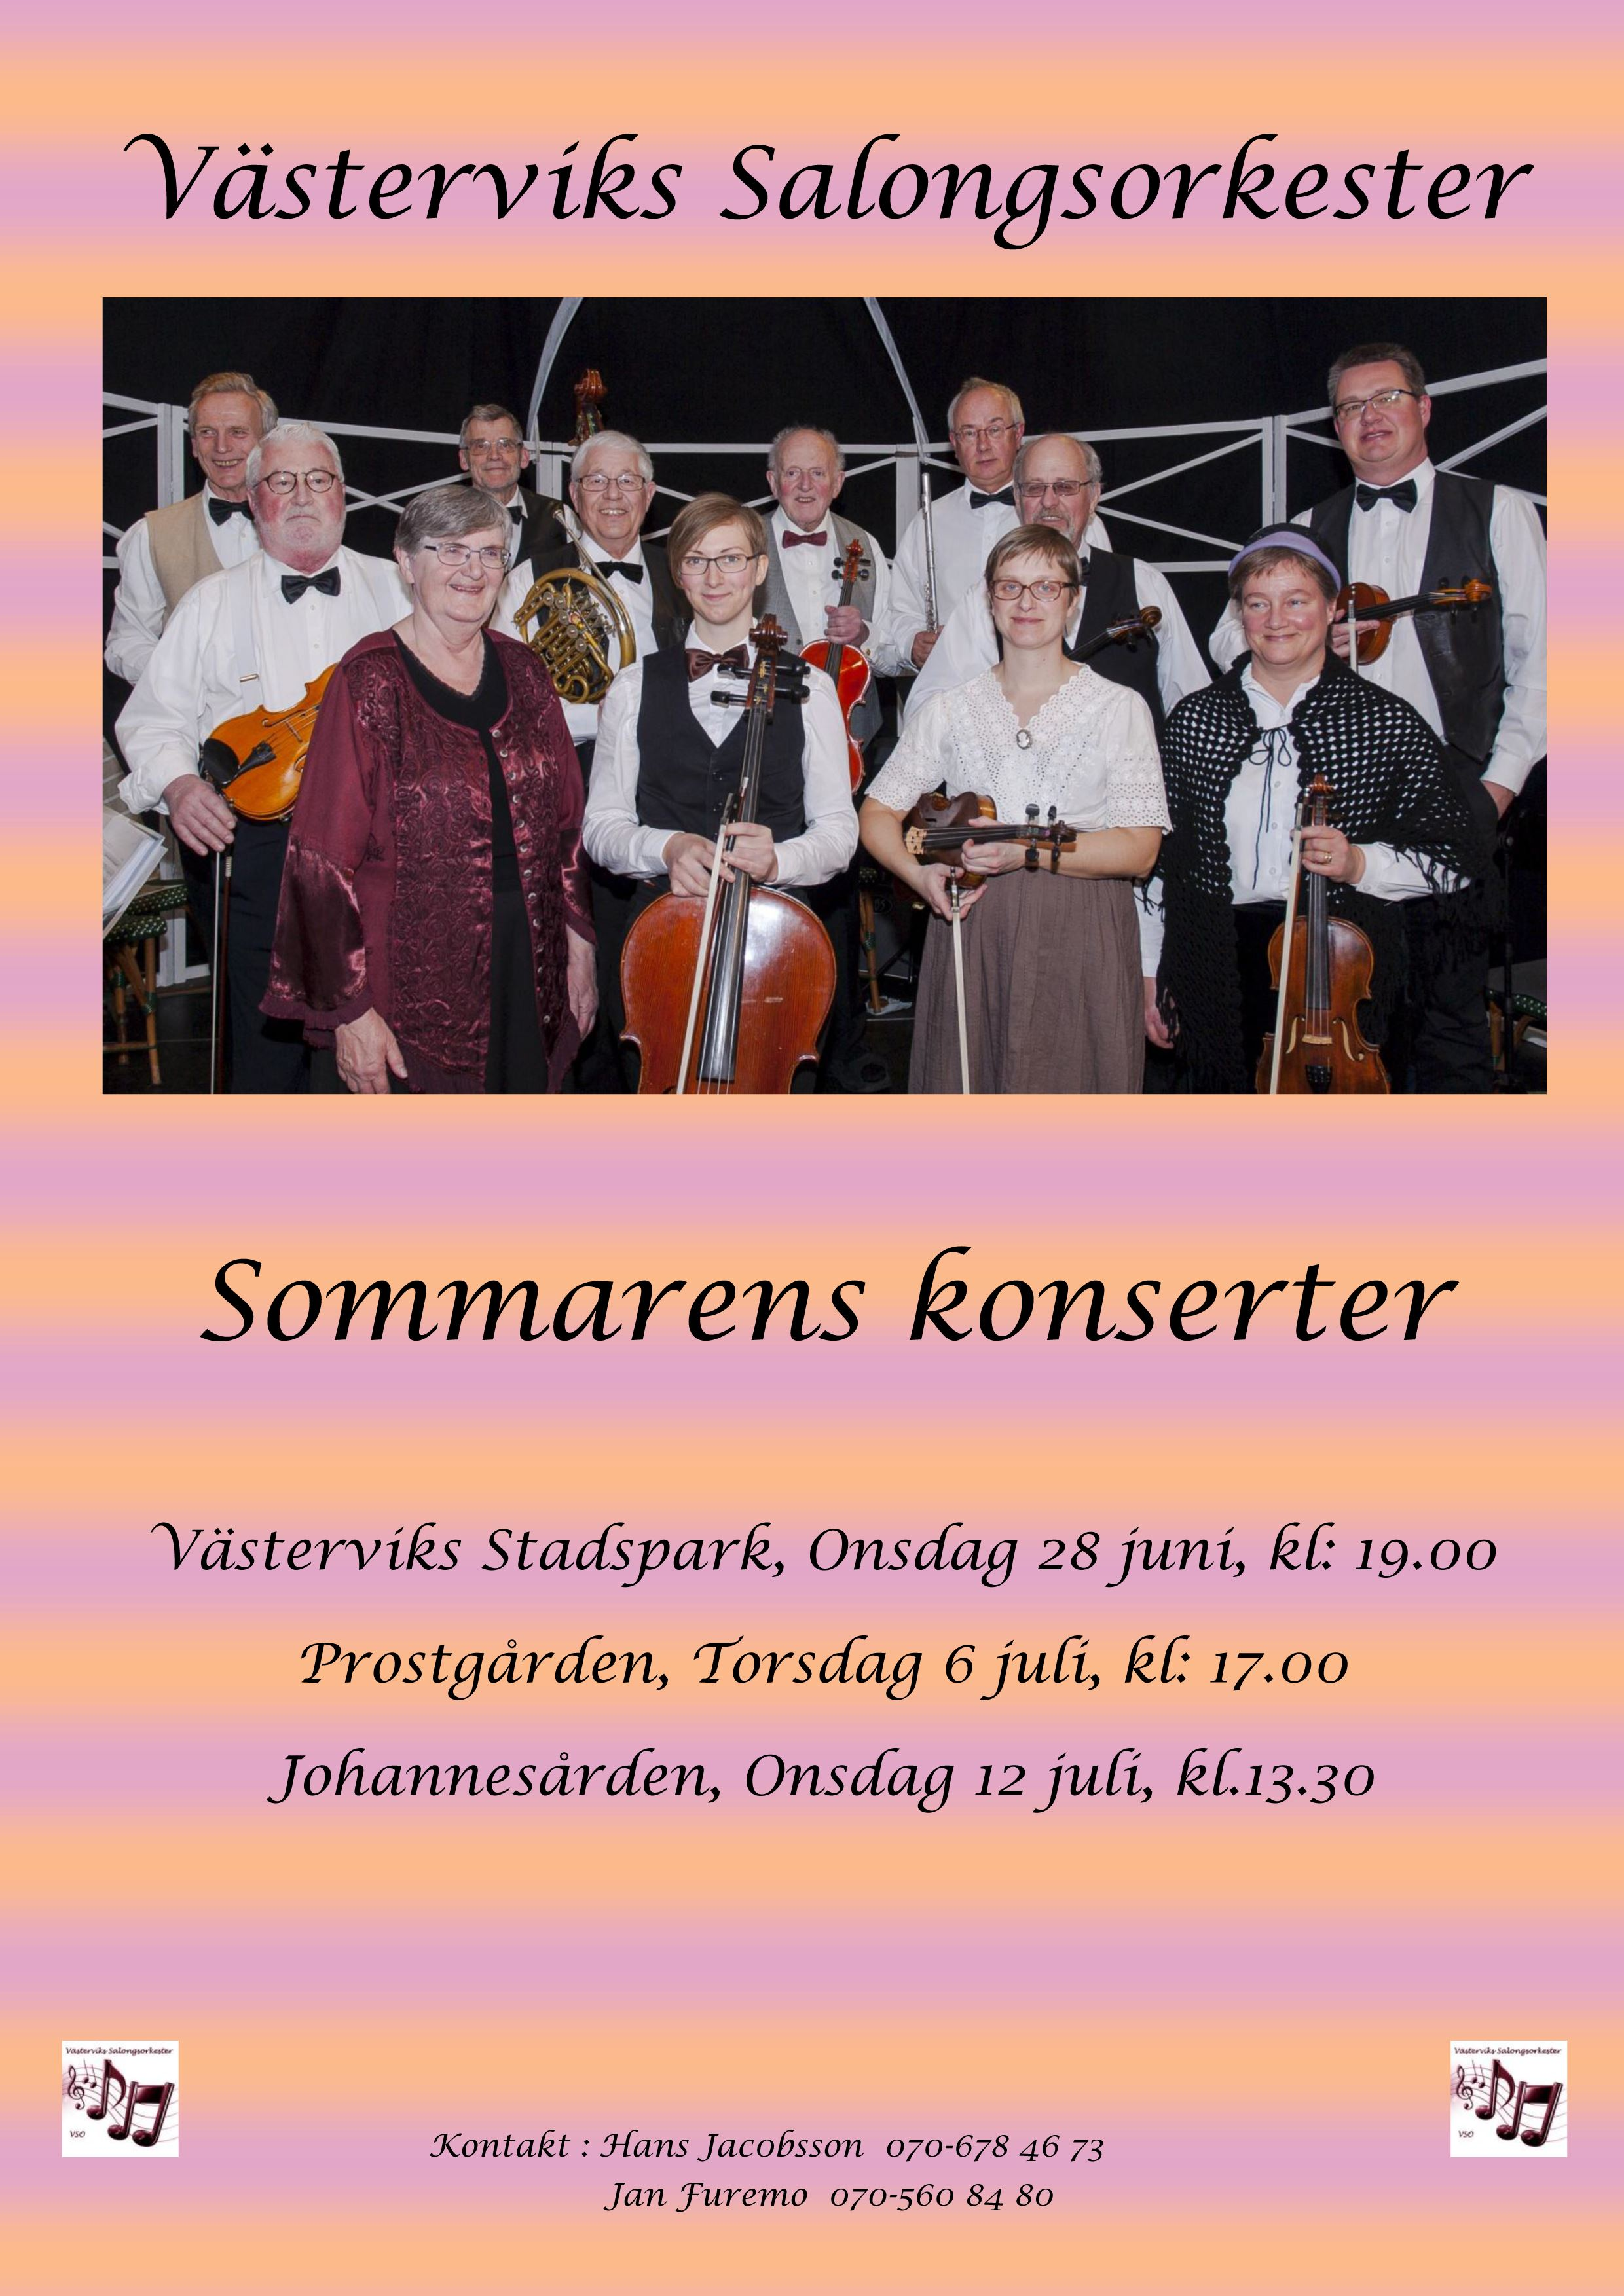 Västervik's Salongsorkester (Lounge Ochestra)